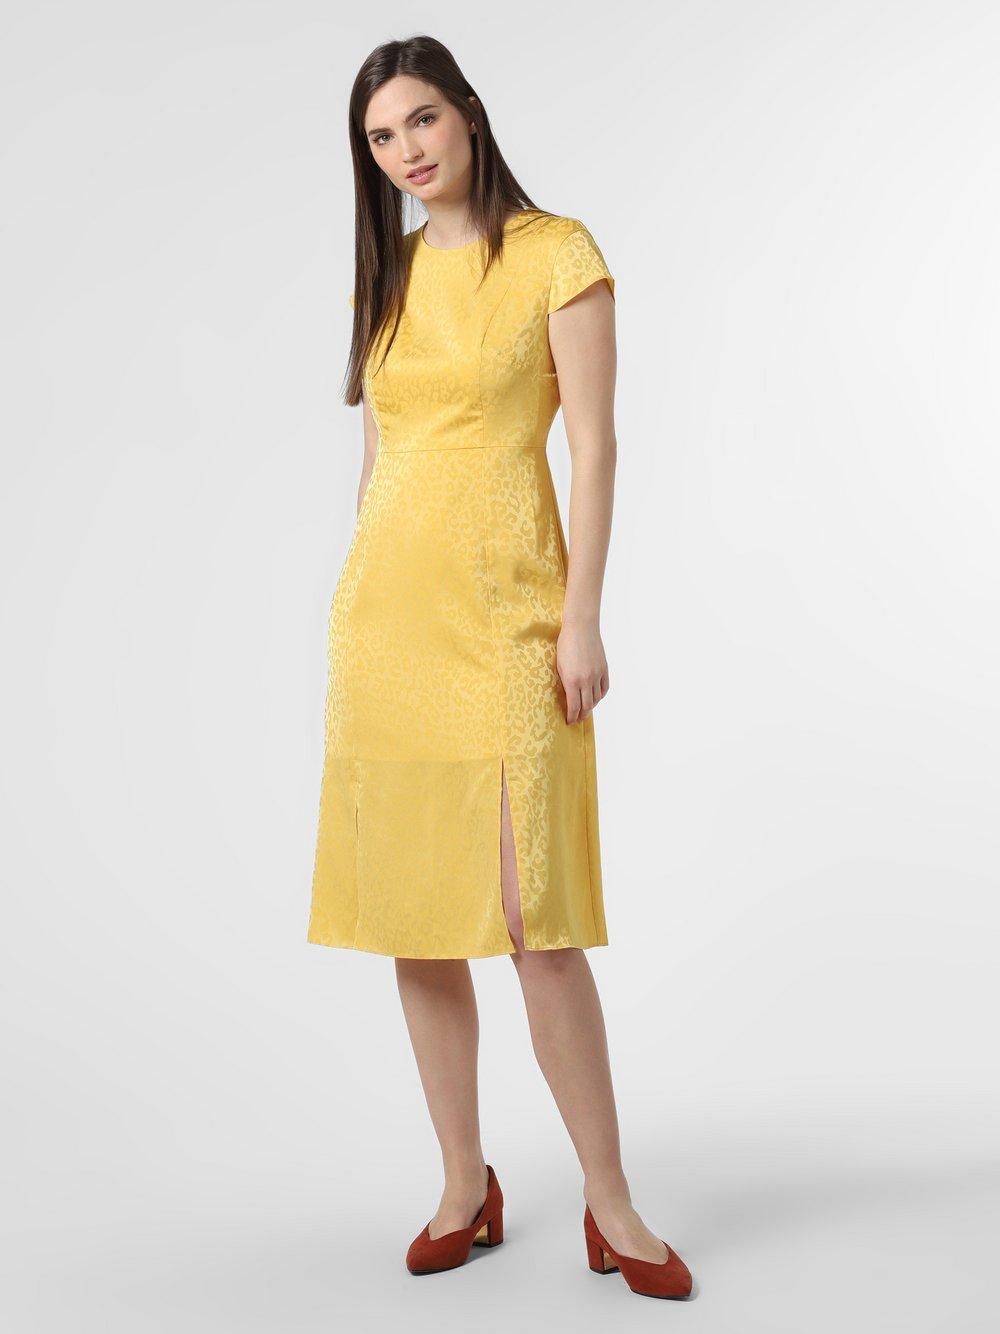 Ted Baker - Sukienka damska – Bellana, żółty